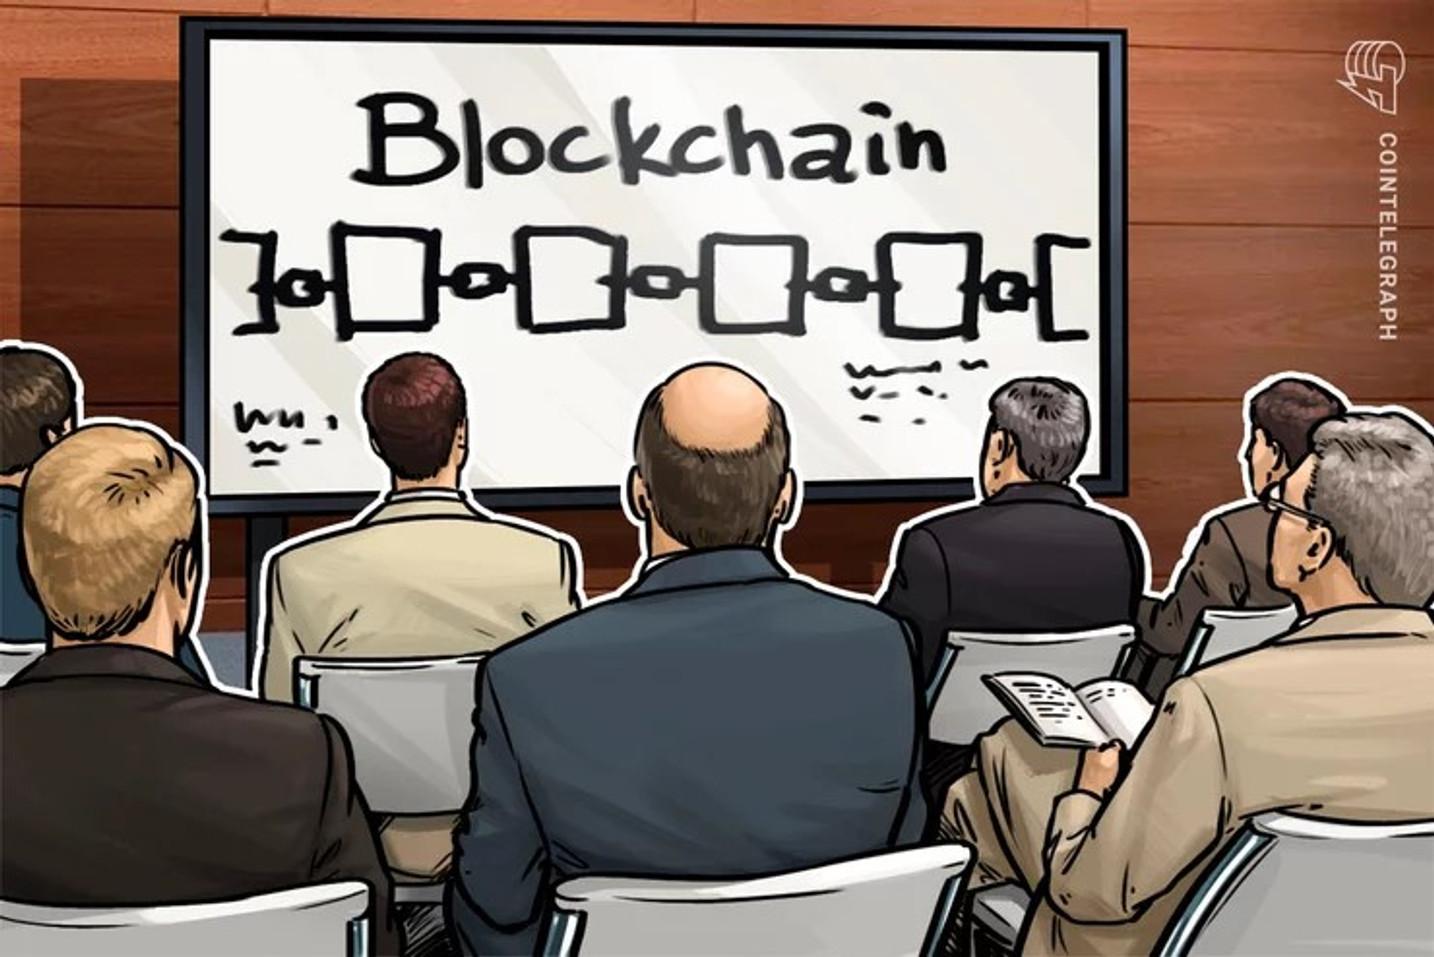 Ex-presidentes do BNDES e do Banco Central se reúnem com CVM e BTG para debater Bitcoin e blockchain